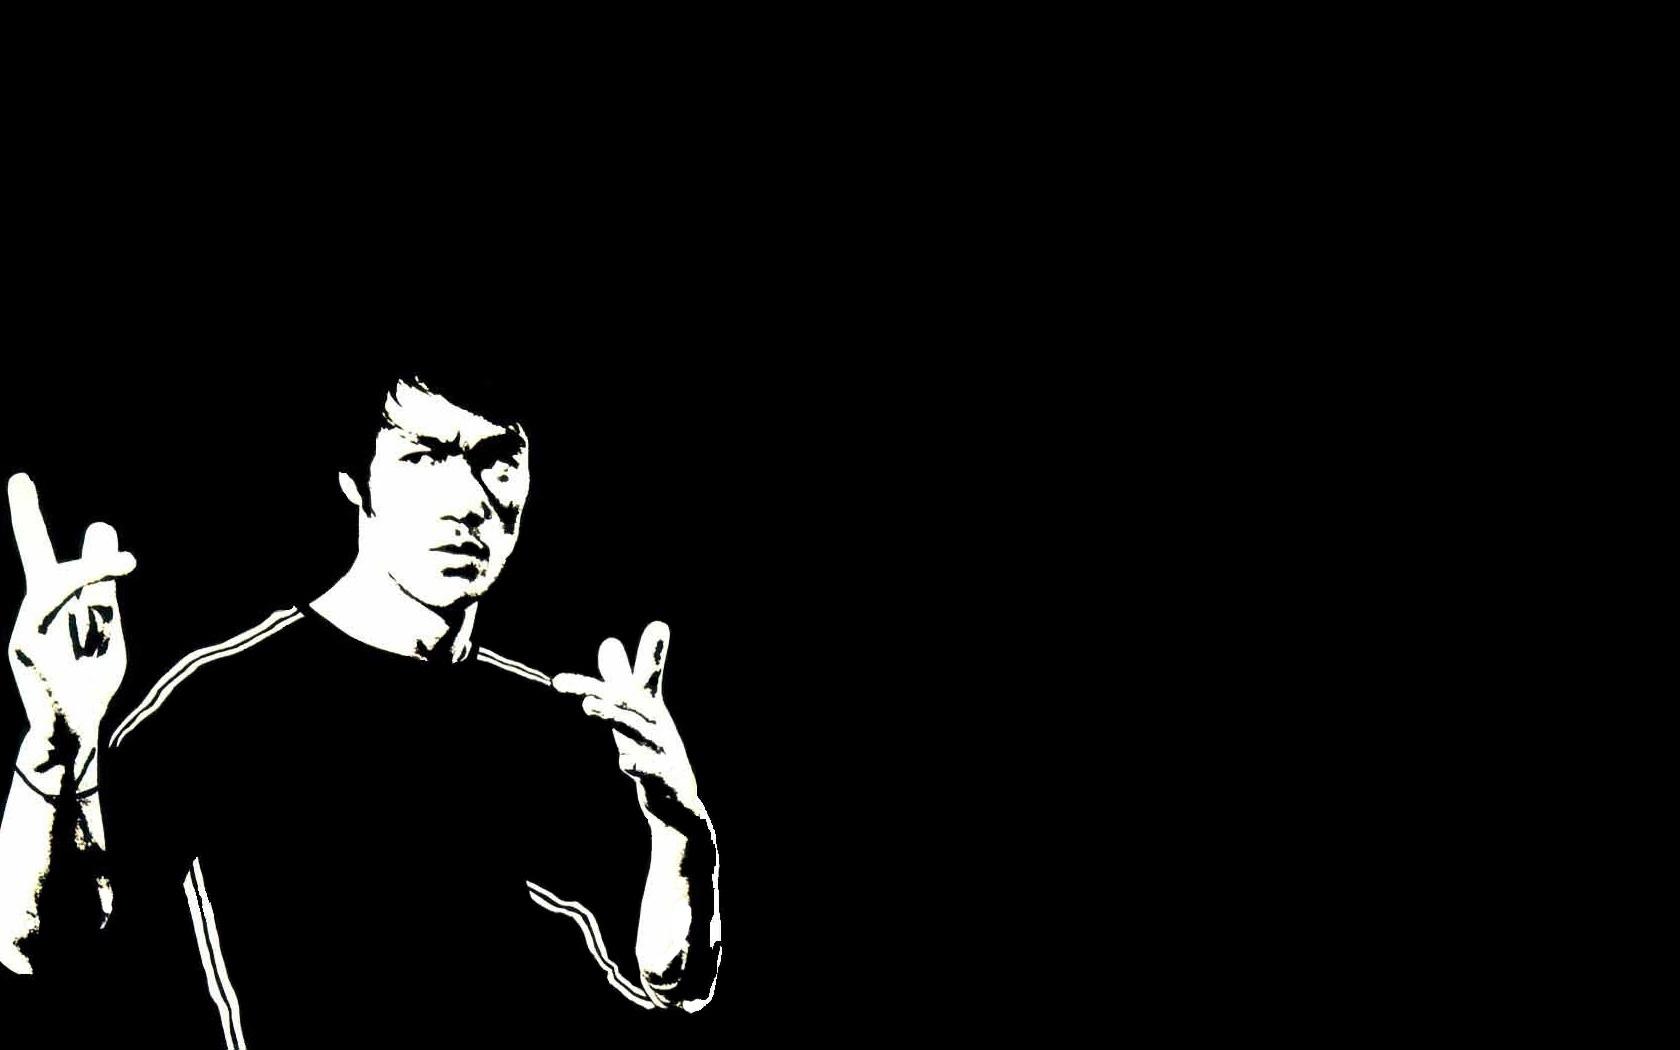 10 Best Bruce Lee Wallpaper 1920X1080 FULL HD 1080p For PC ...